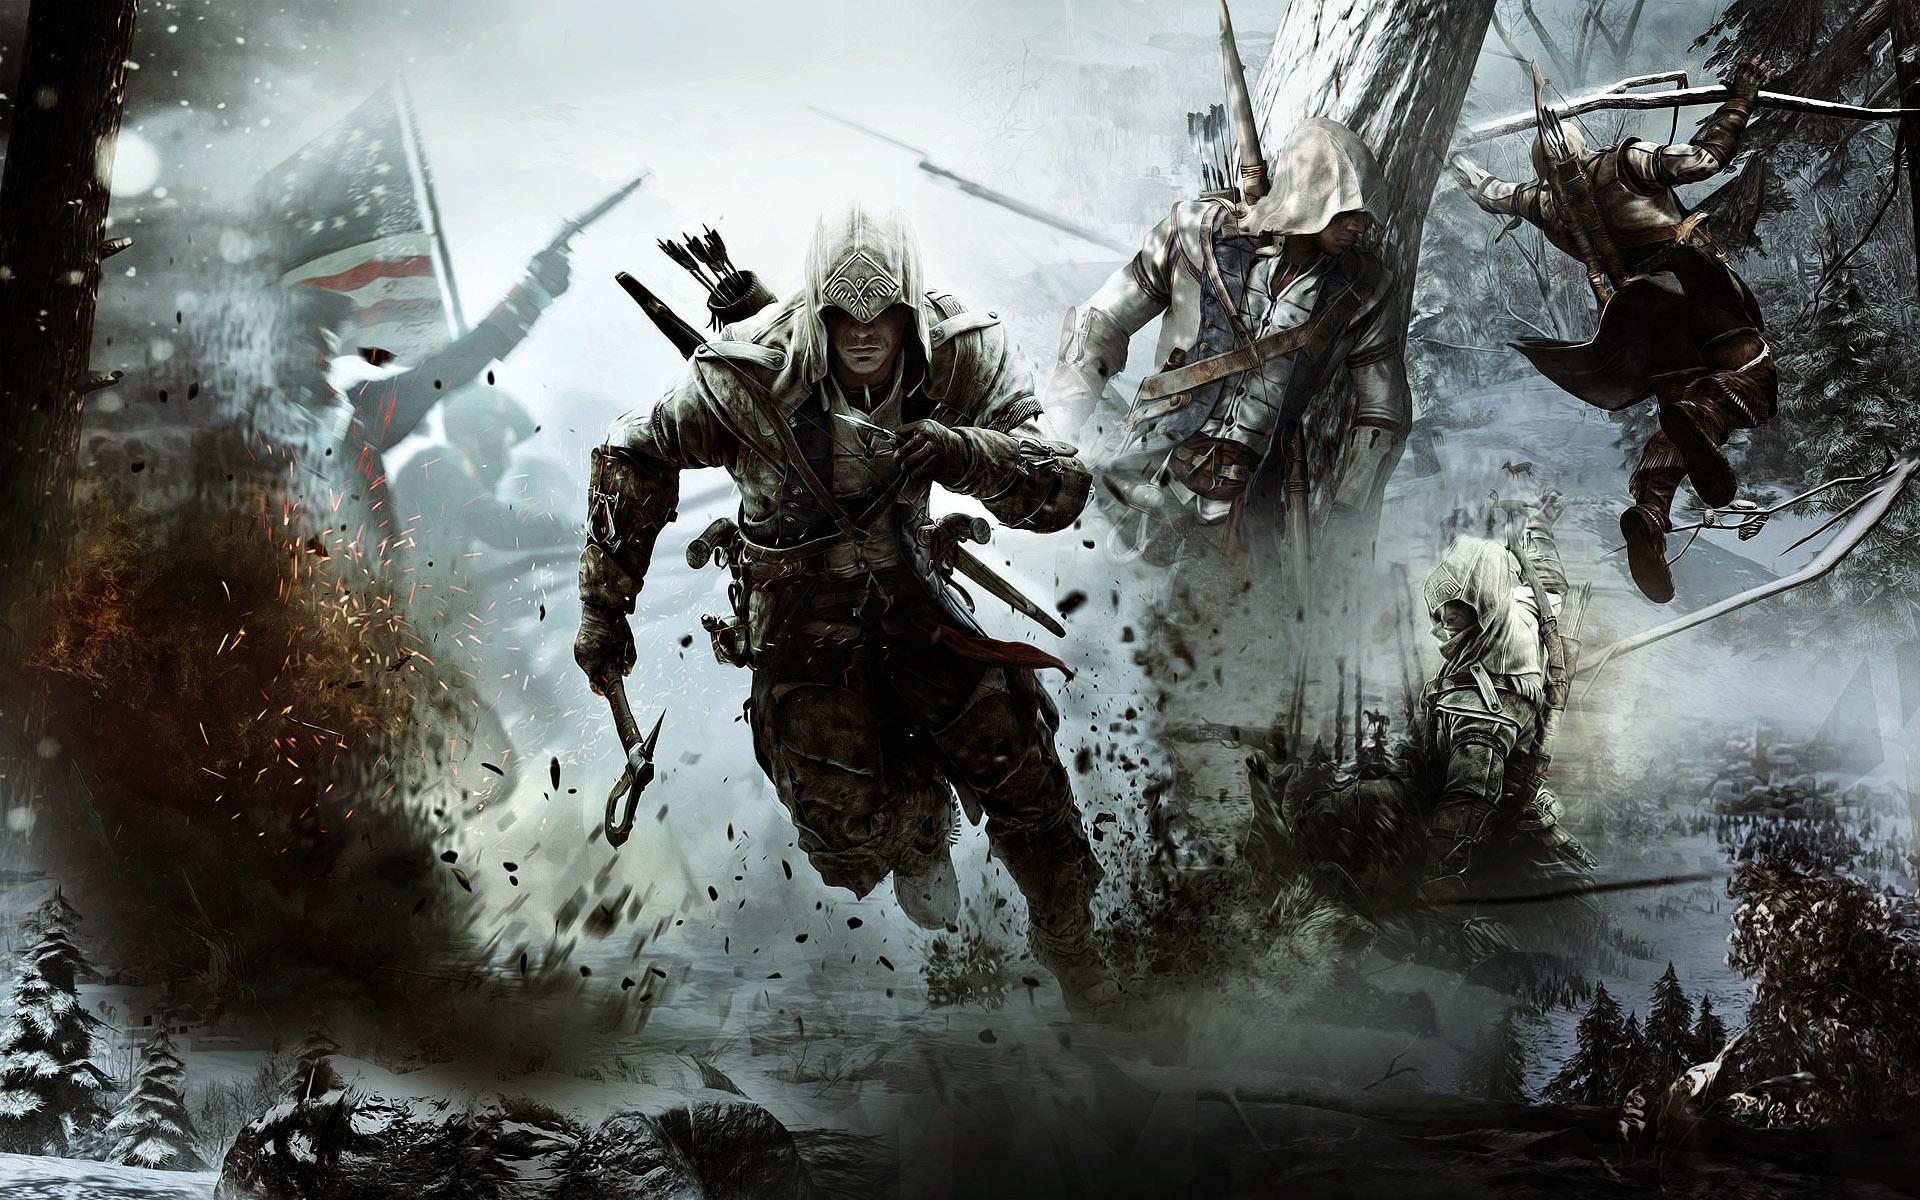 Download Assassins Creed 3 Wallpaper Hd 1080p Assassin S Creed 3